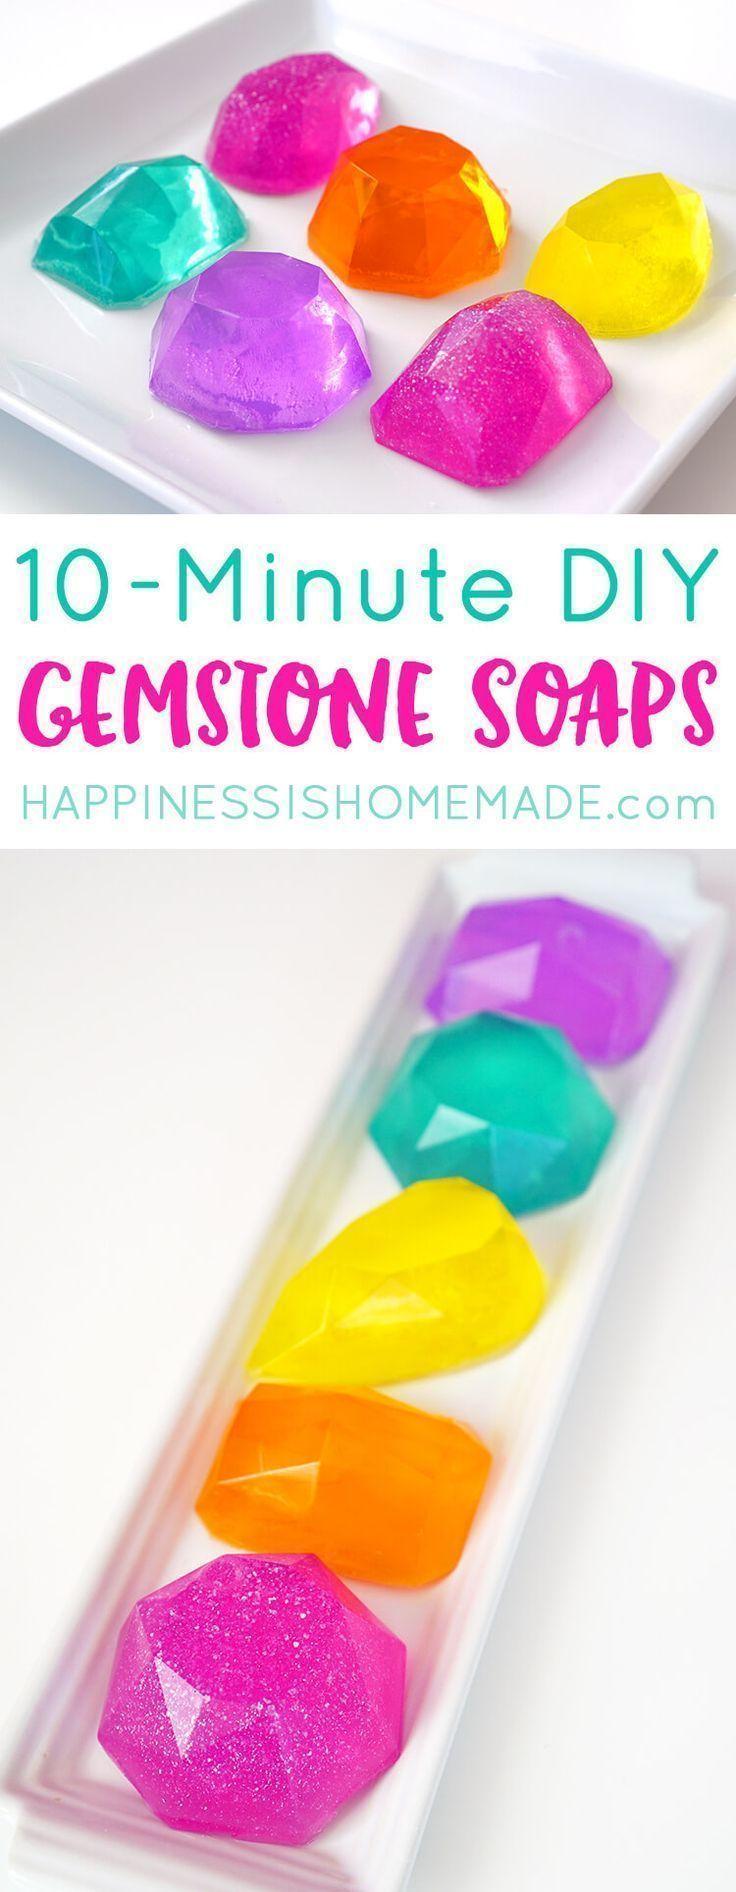 10-Minute DIY Gemstone Soaps -   17 diy Soap gemstone ideas